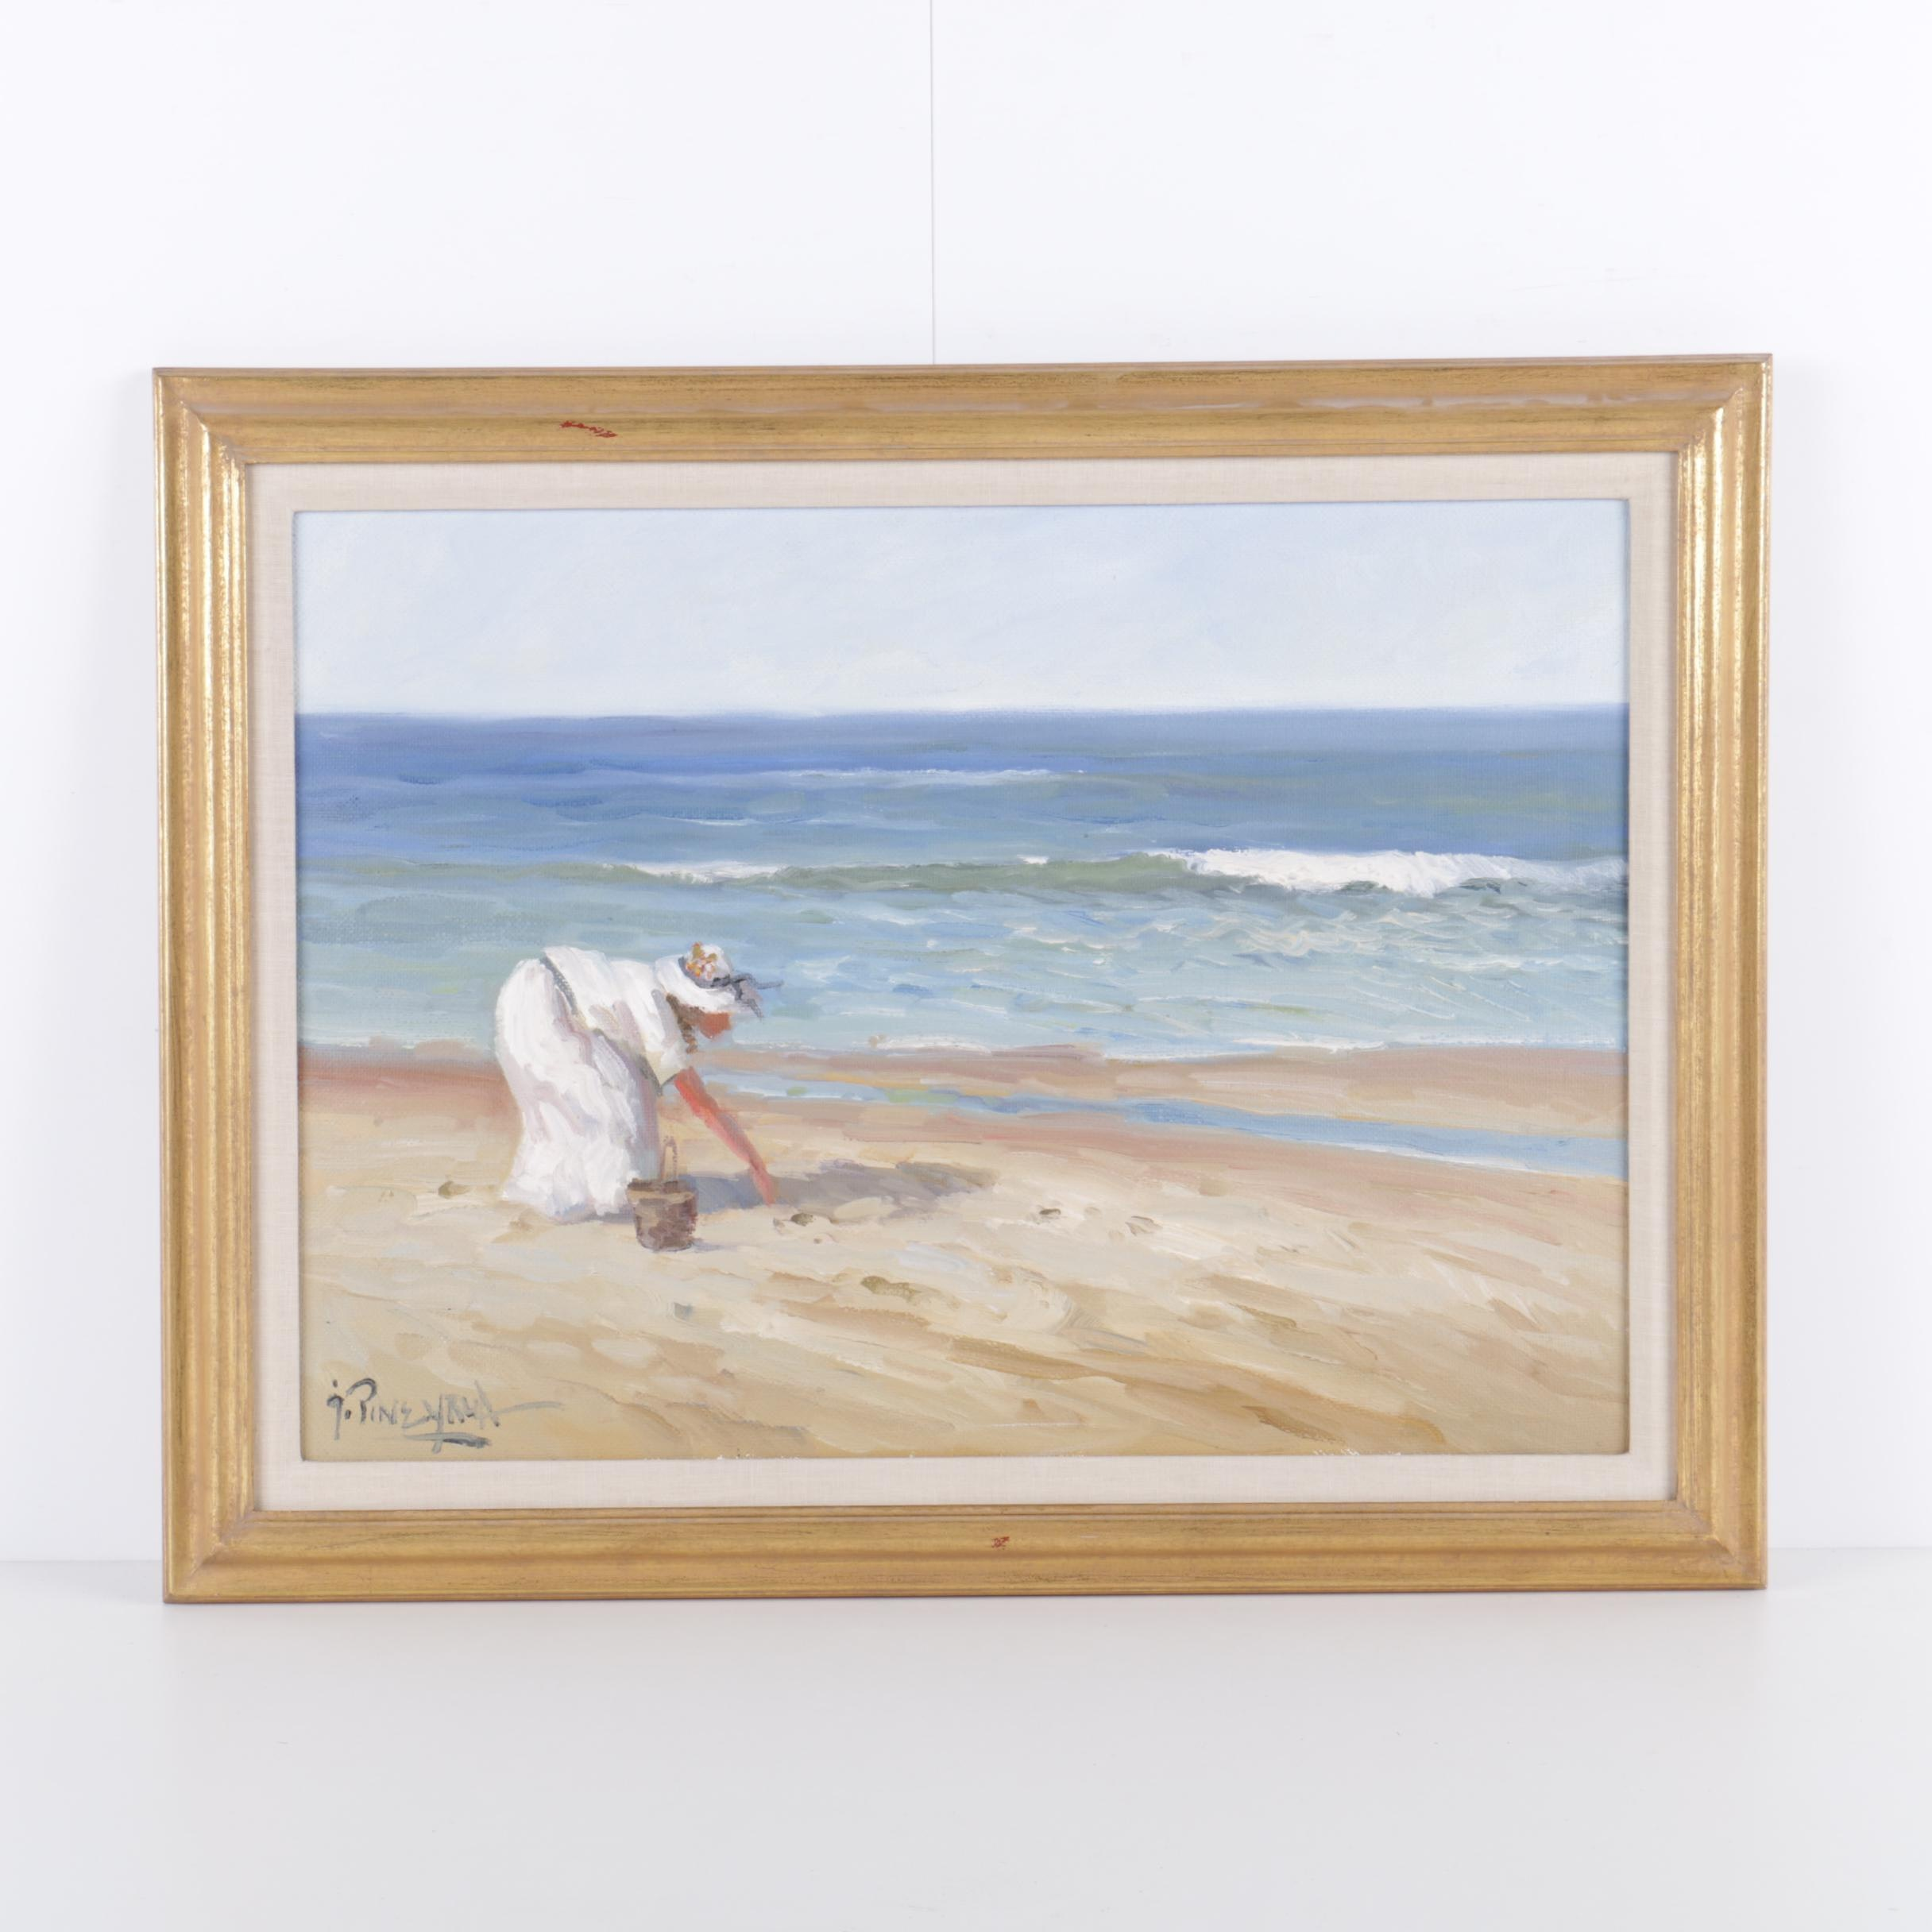 Jorge Pineyrua Acrylic Painting on Canvas of Woman on Beach